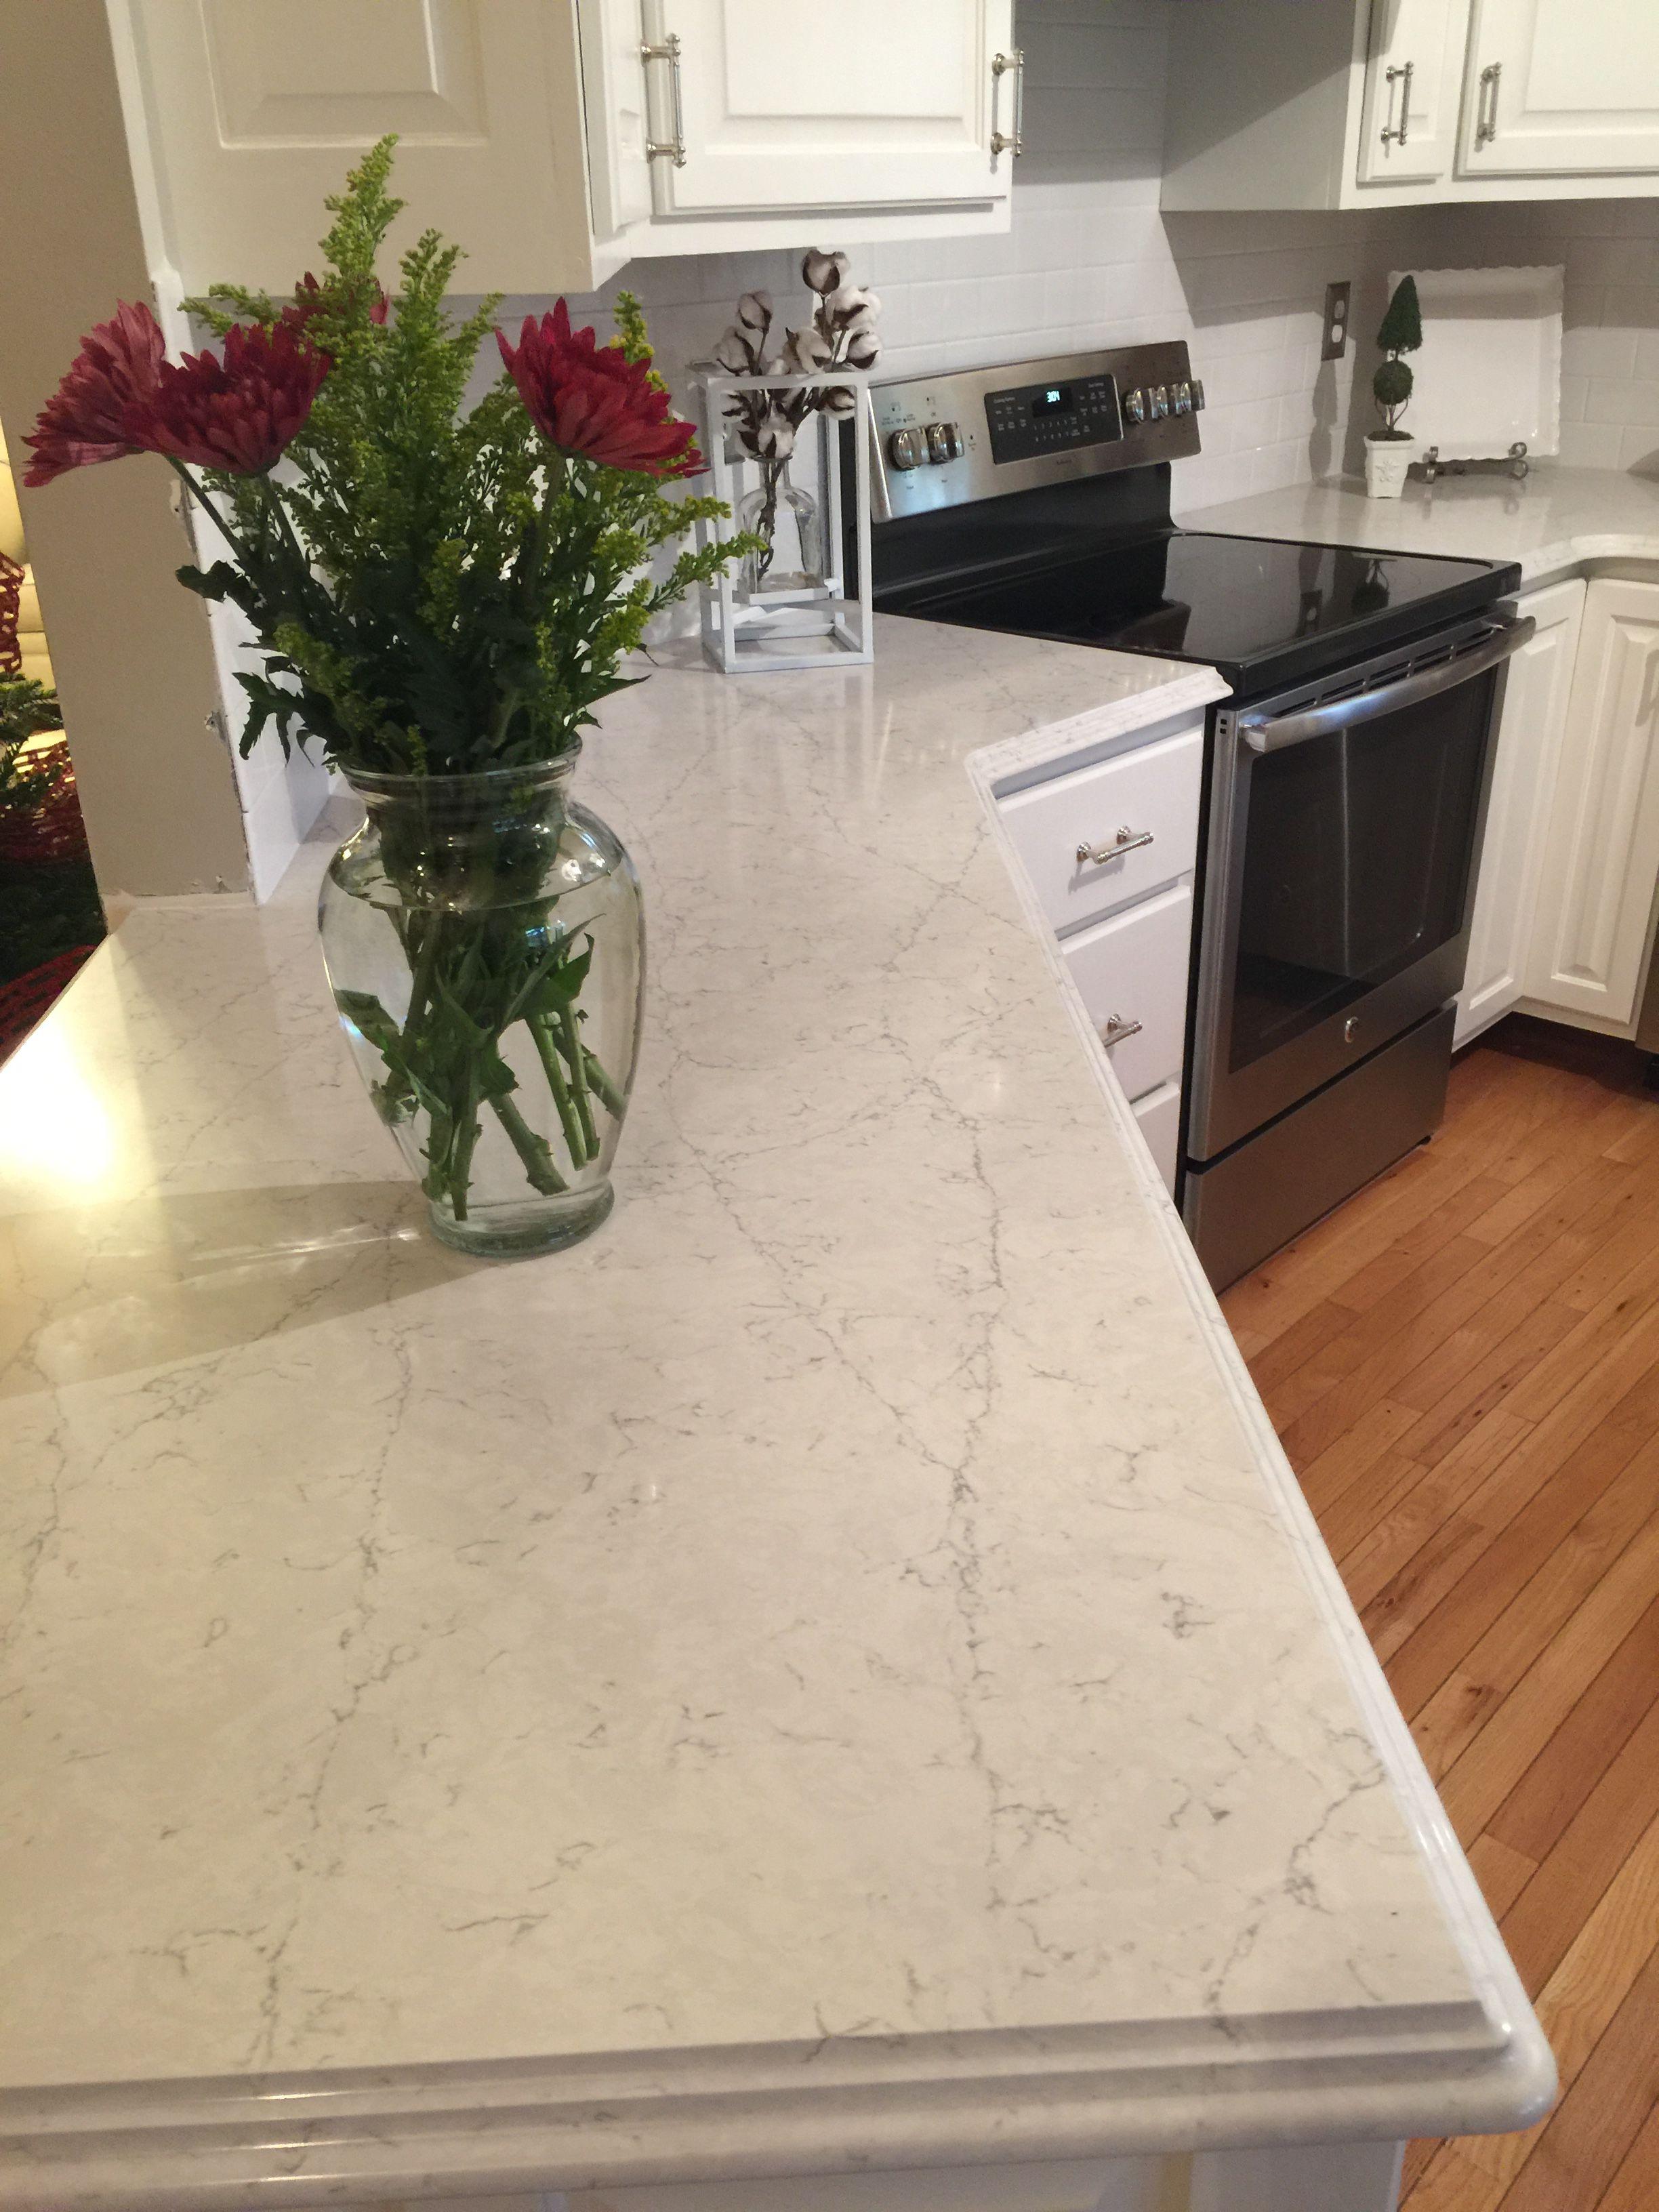 Inexpensive Countertops For Kitchens Kitchen Cabinet Storage Ideas Silestone Pearl Jasmine Countertop Decorating Materials Backsplash